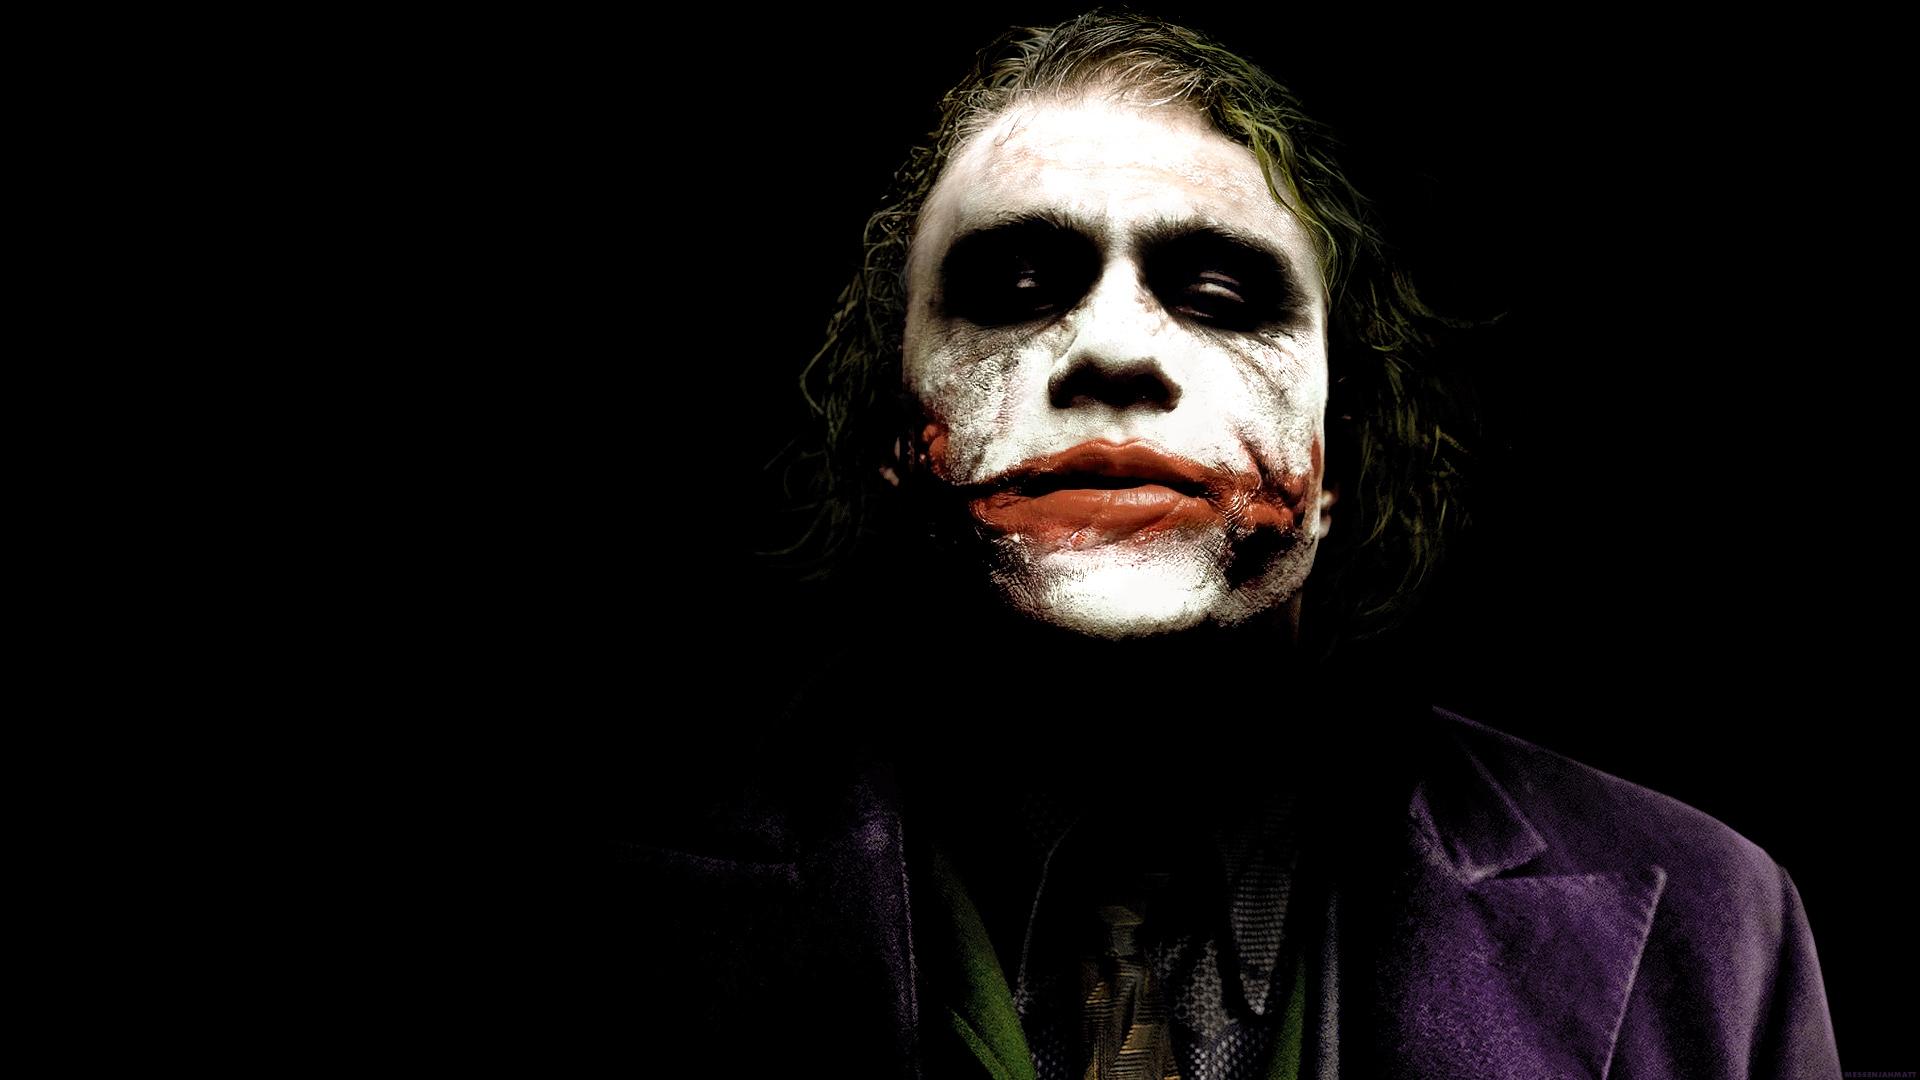 the joker 00298271jpg 1920x1080